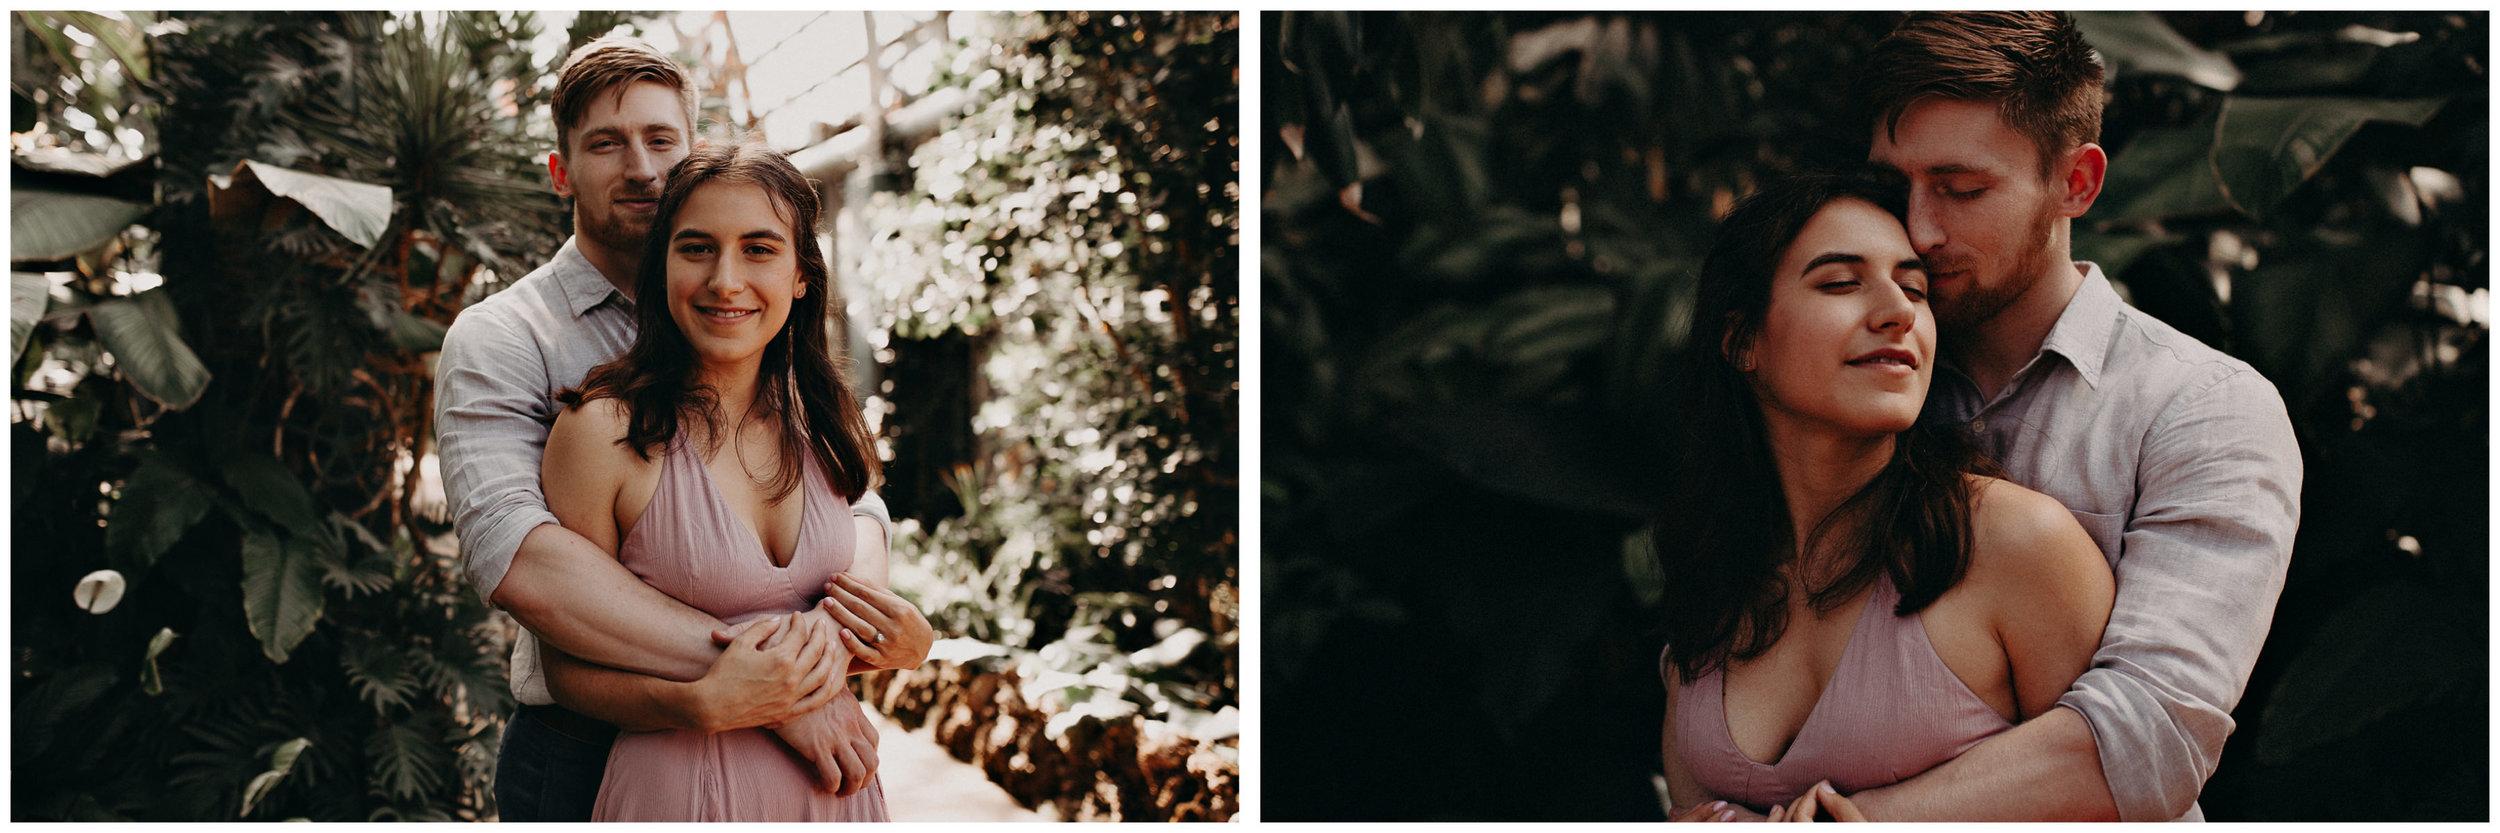 8- Chicago engagement wedding photographer - Aline Marin Photography.jpg